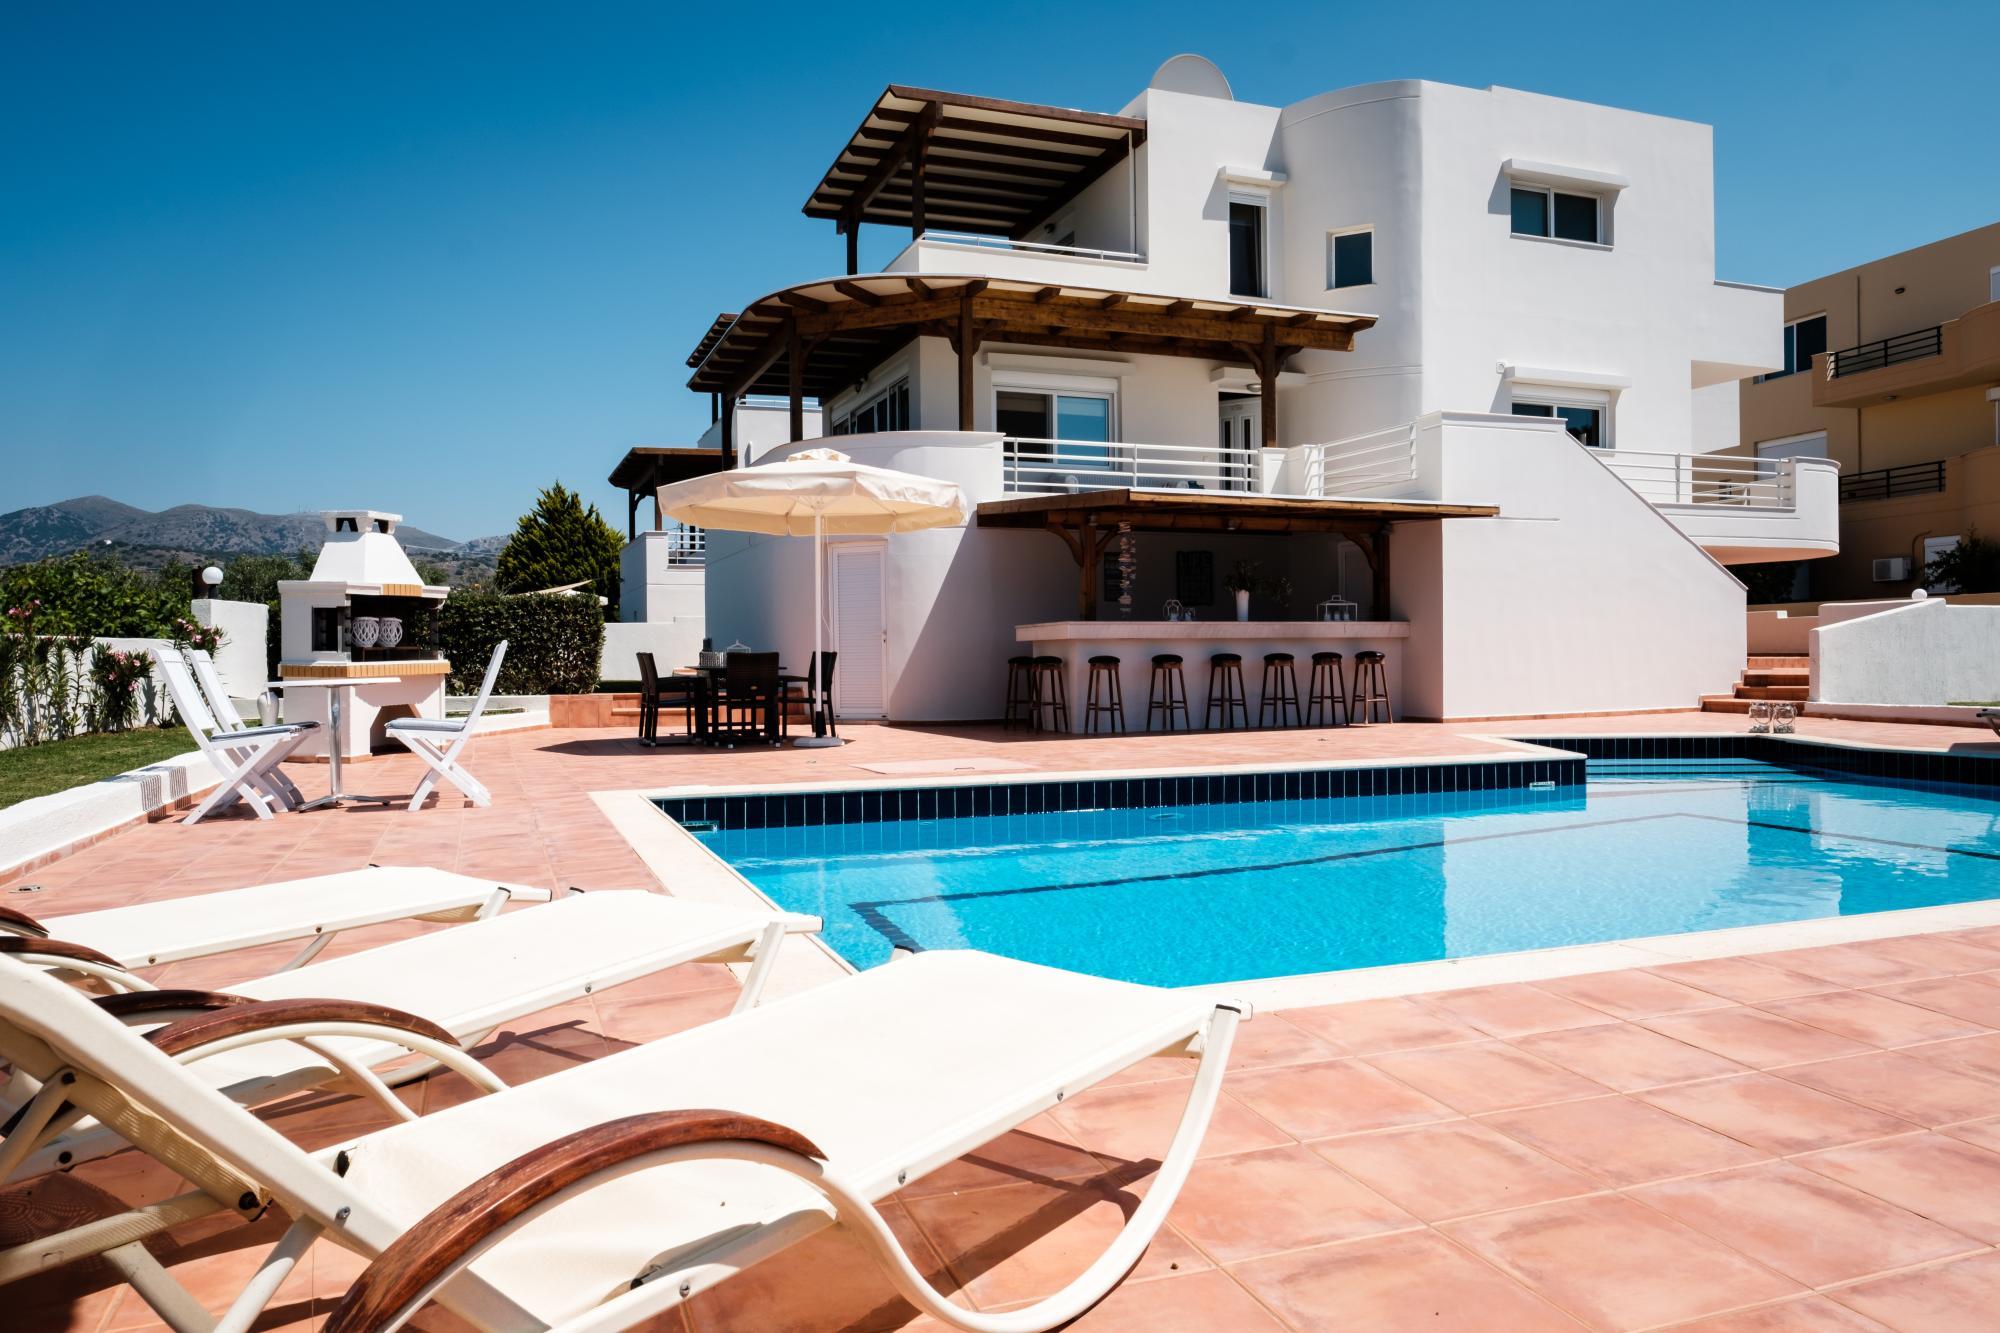 Wonderful 3 bedroom villa with swimming pool and sea views.